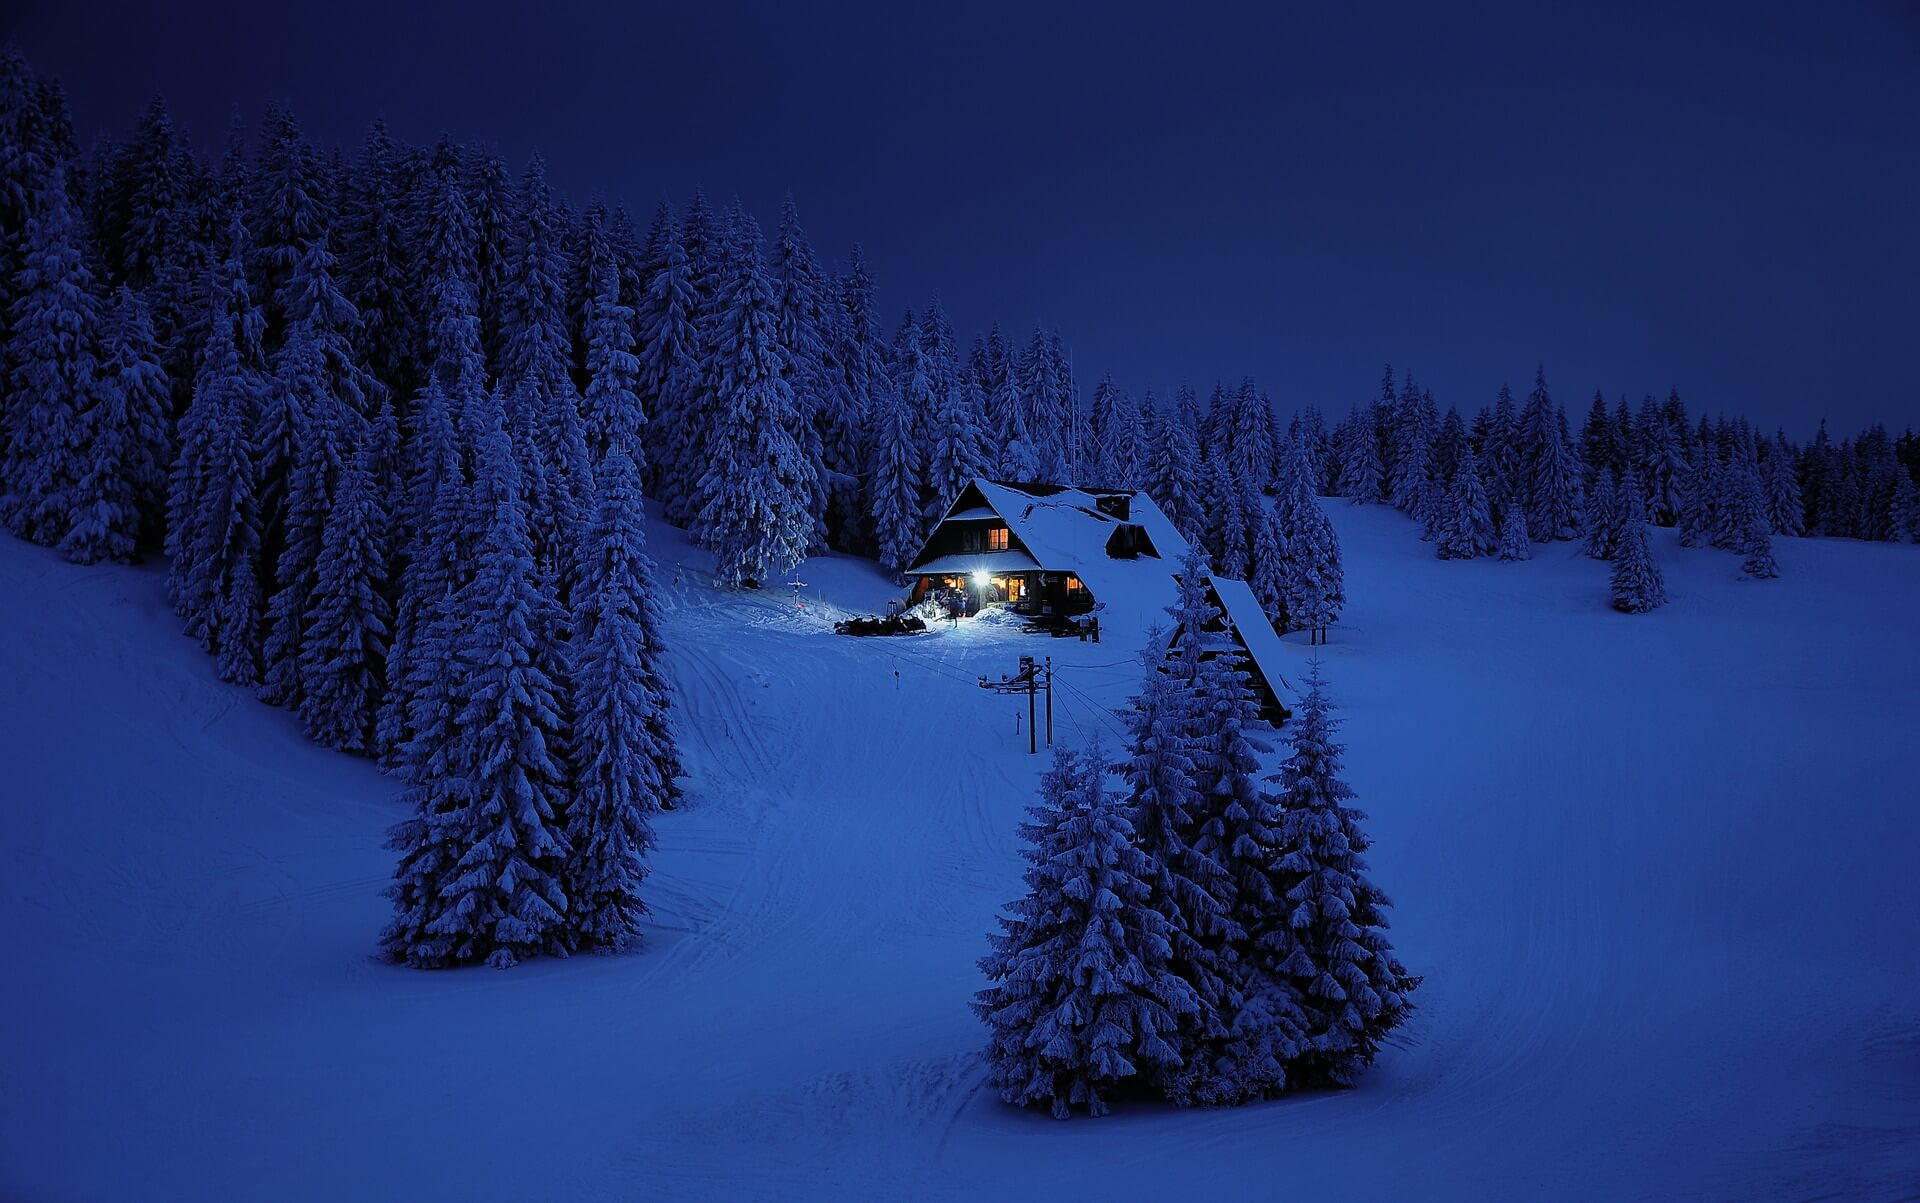 snow-3373432_1920